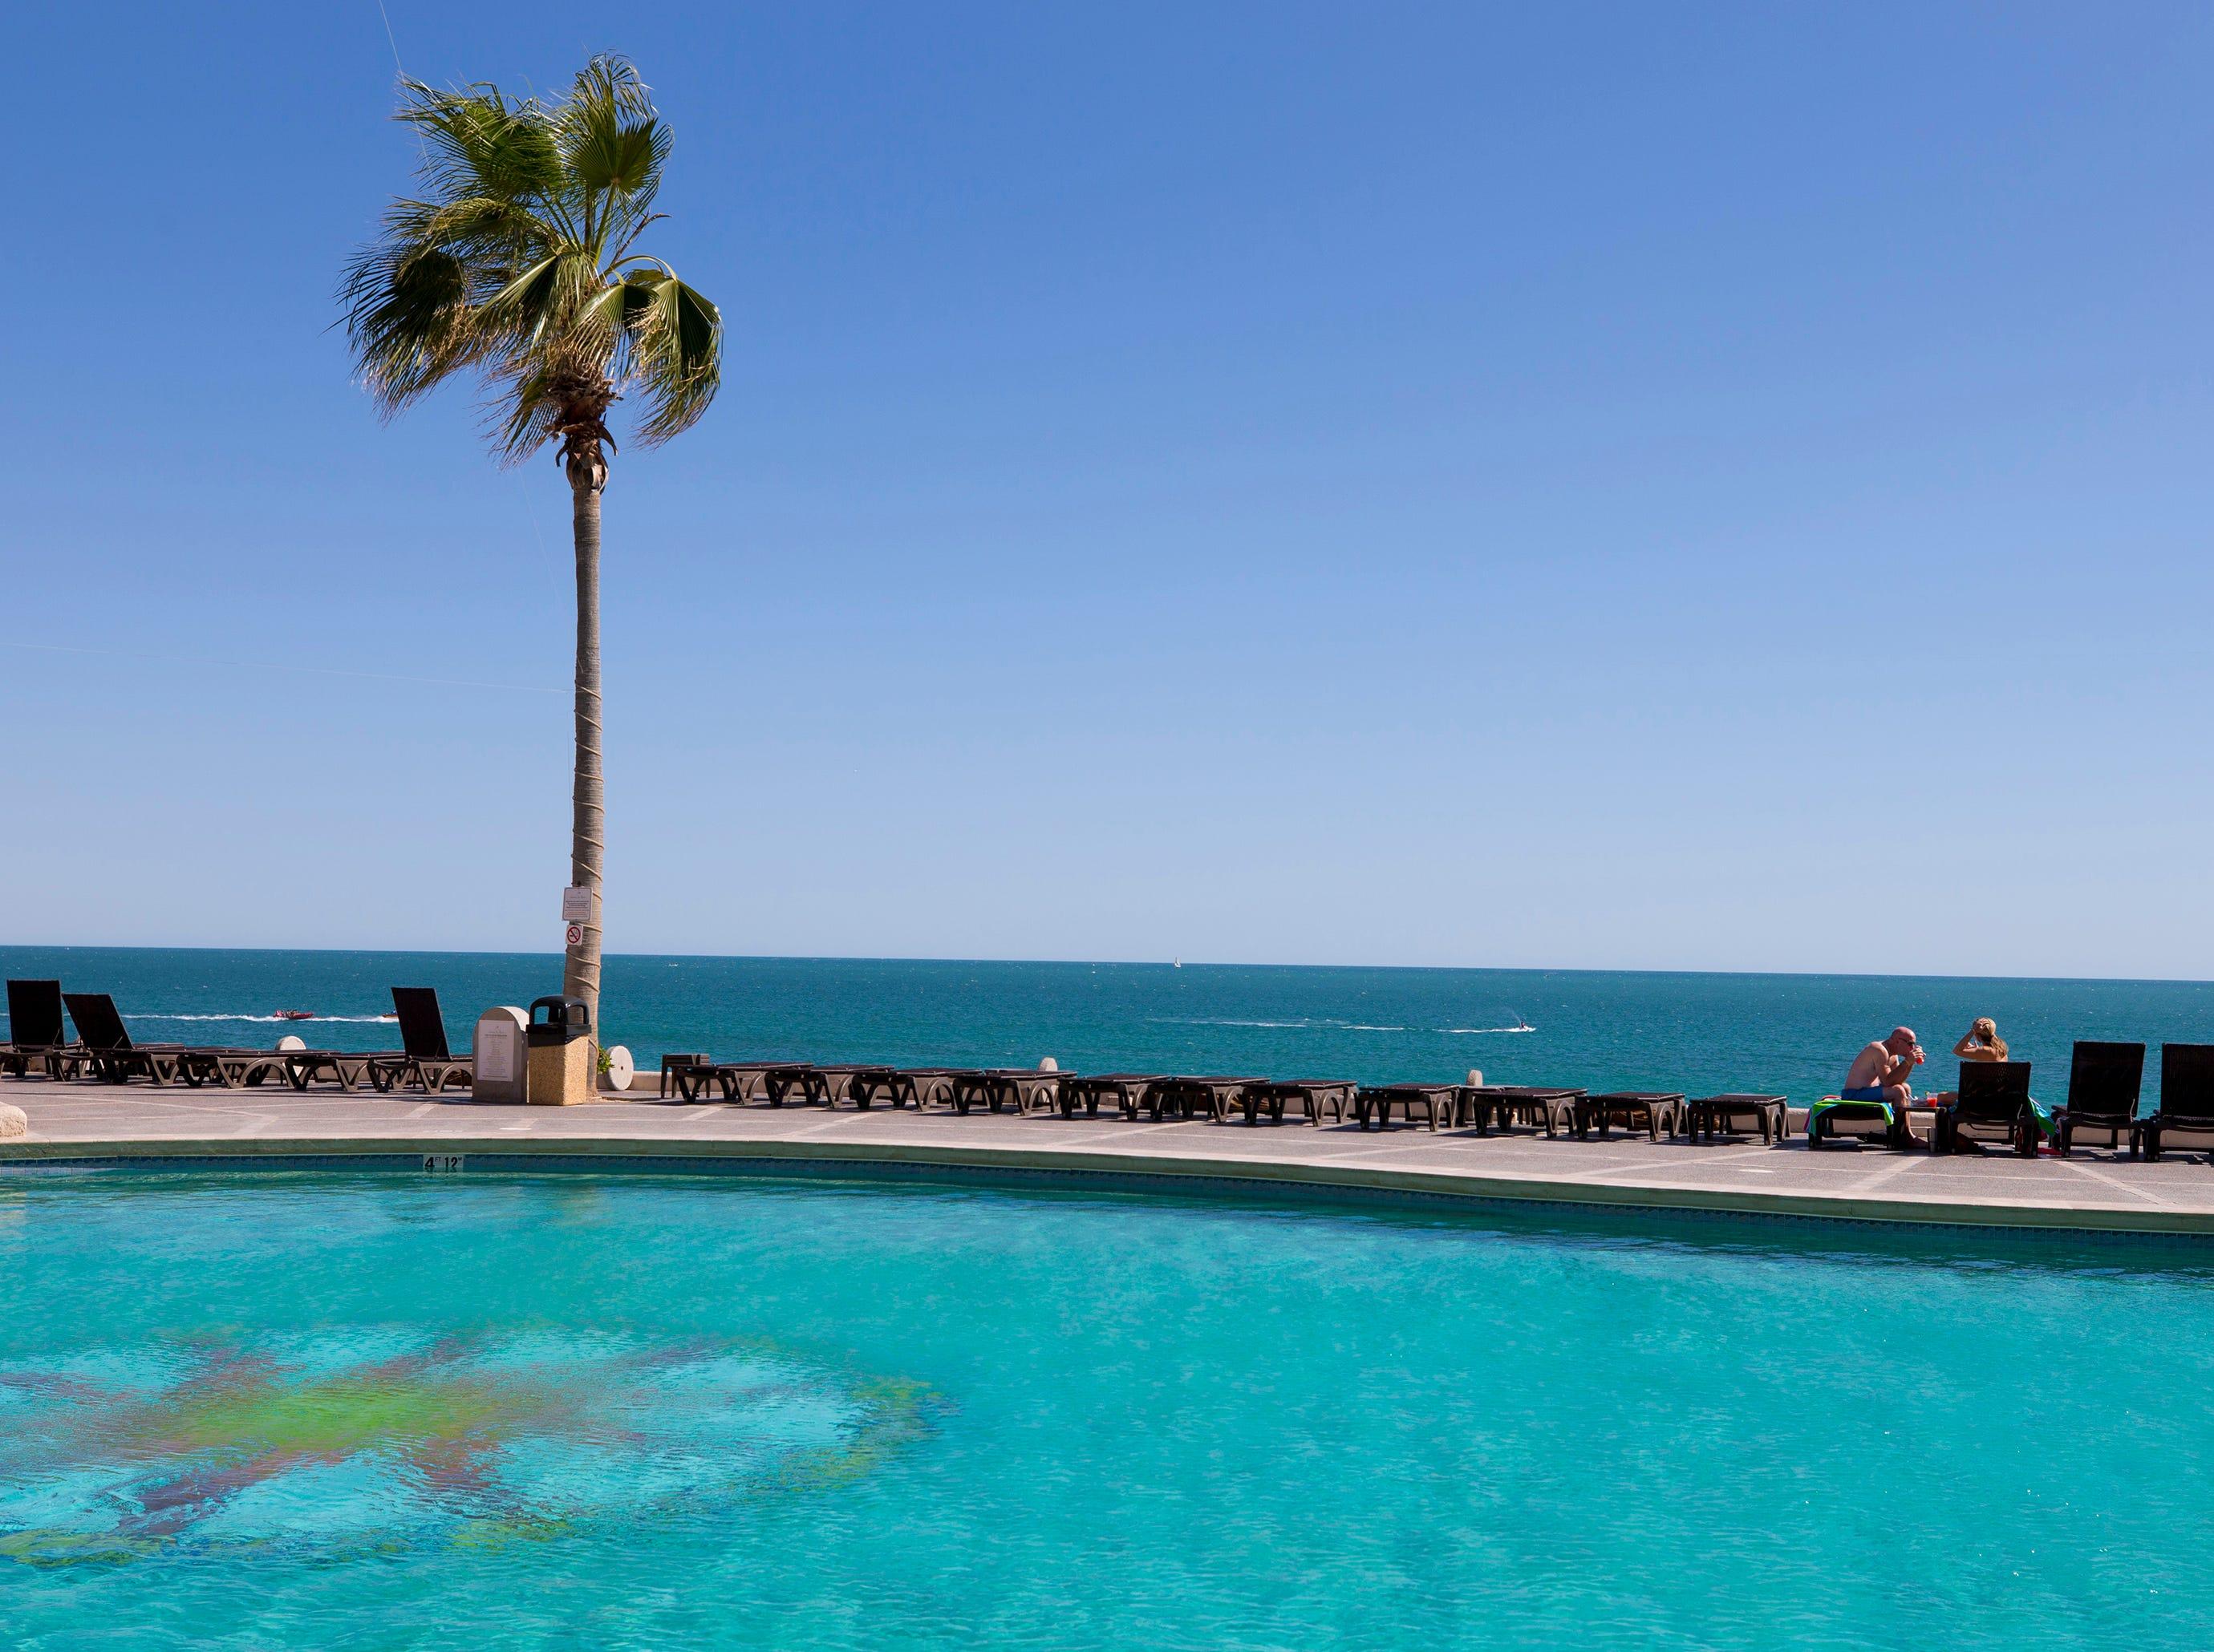 Sonoran Sun Resort is ocean front property on Sandy Beach in Puerto Penasco, Mexico.